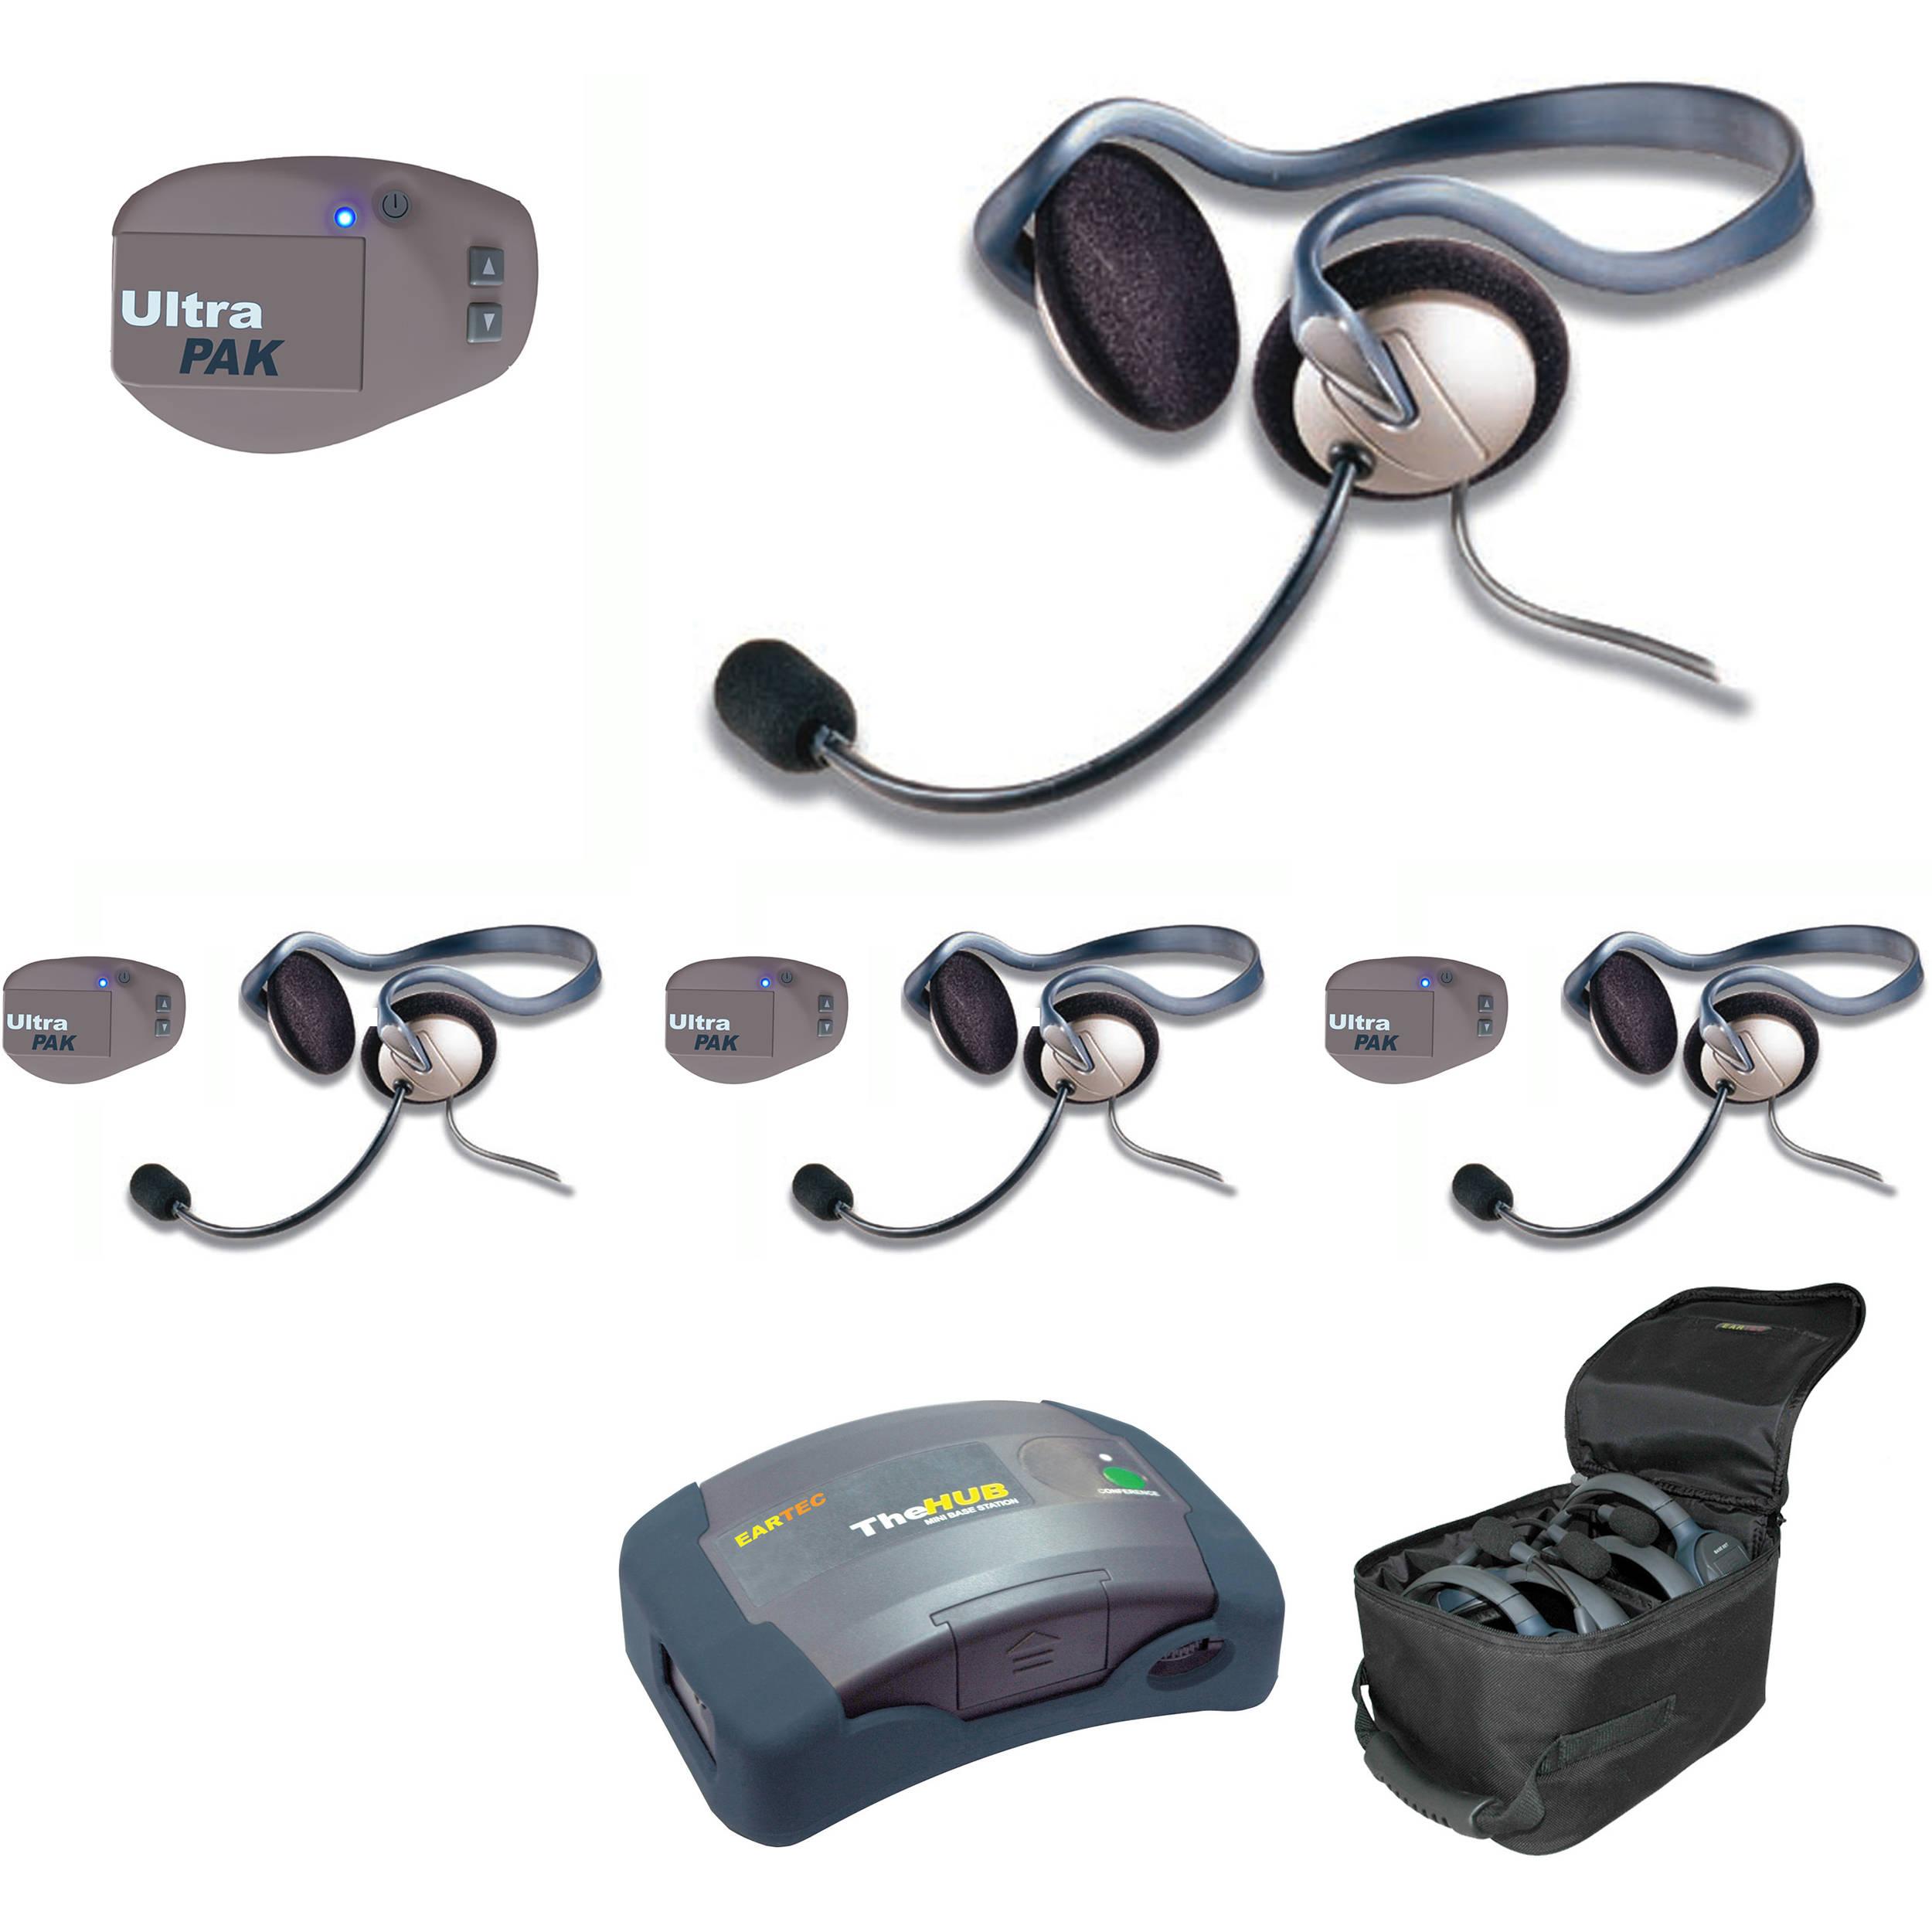 Https C Product 1371828 Reg Electronic Watchdog Kit Quality Electronics Store Kingston Ontario Eartec Upmon4 1 Hub 4 Ultrapak 1392495